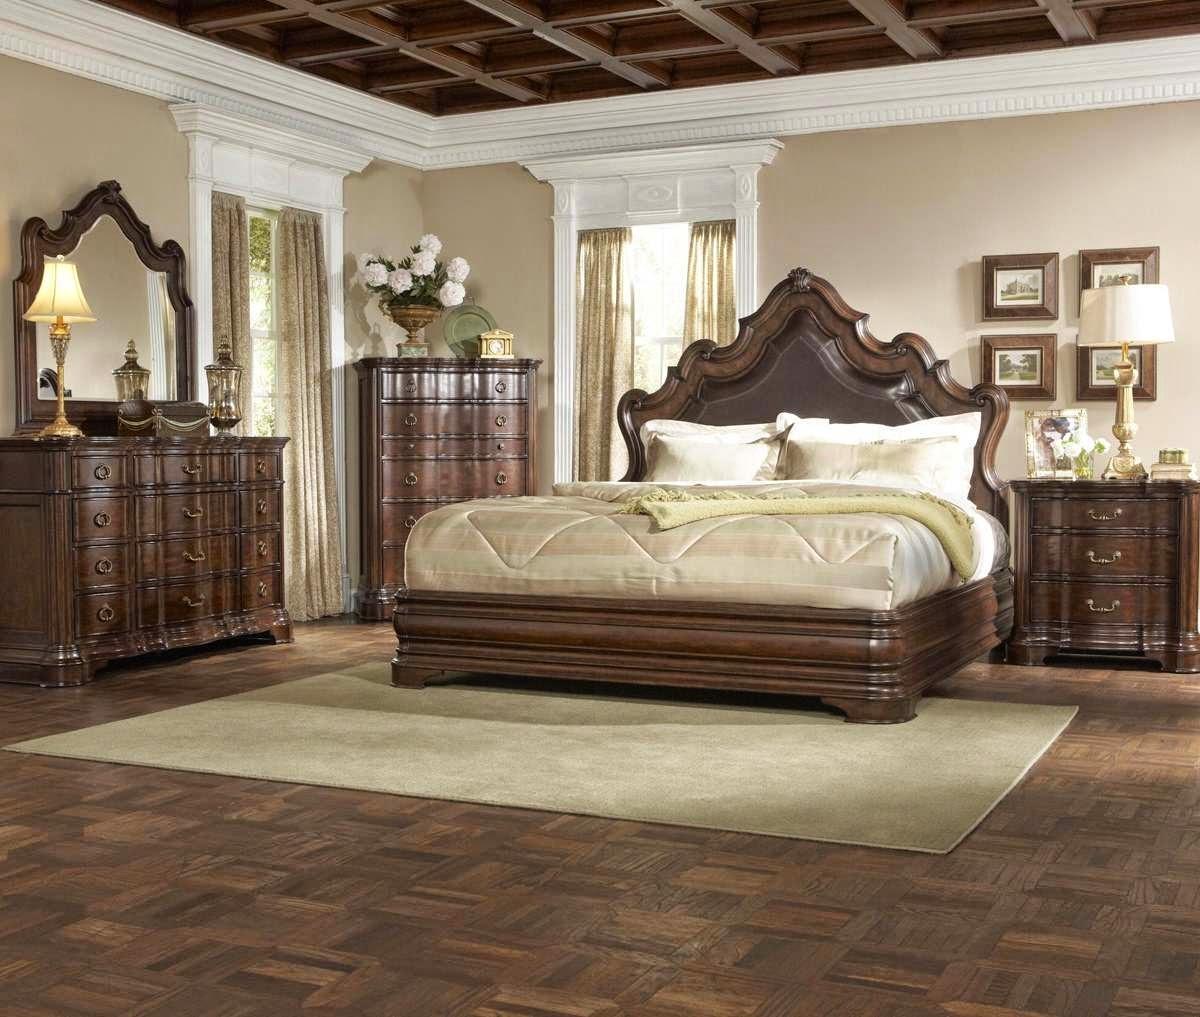 Mirror Bedroom Furniture Ideas 2014  Home Design